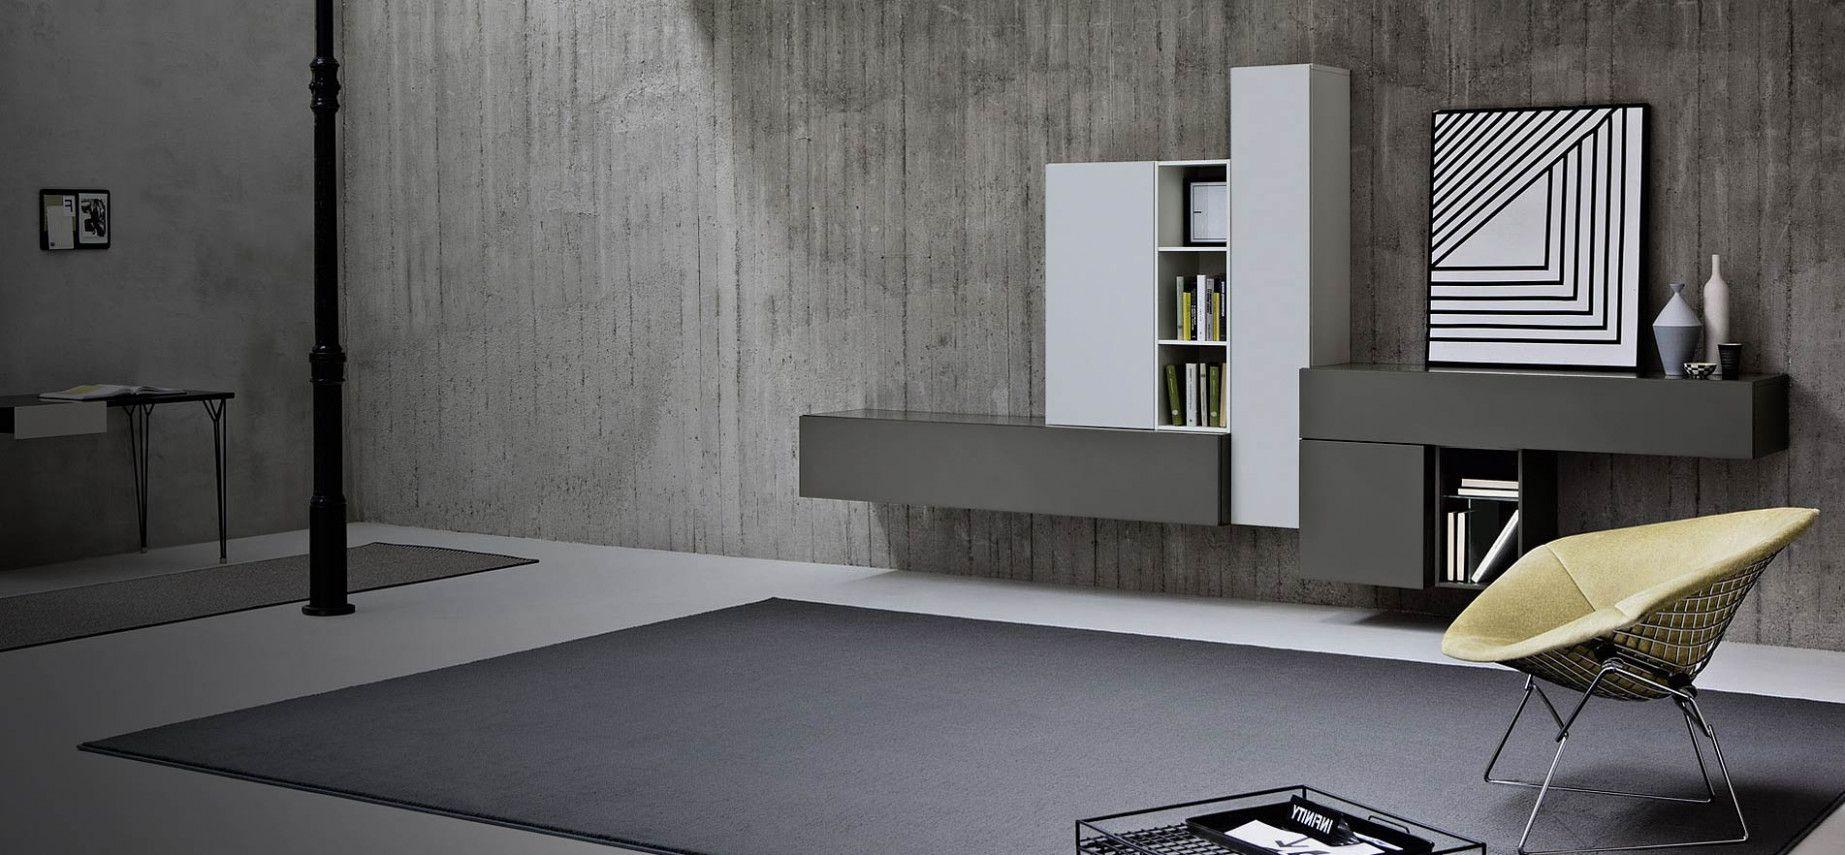 14 Hangeschrank Wohnzimmer Trendy Home Decor Shelves Home